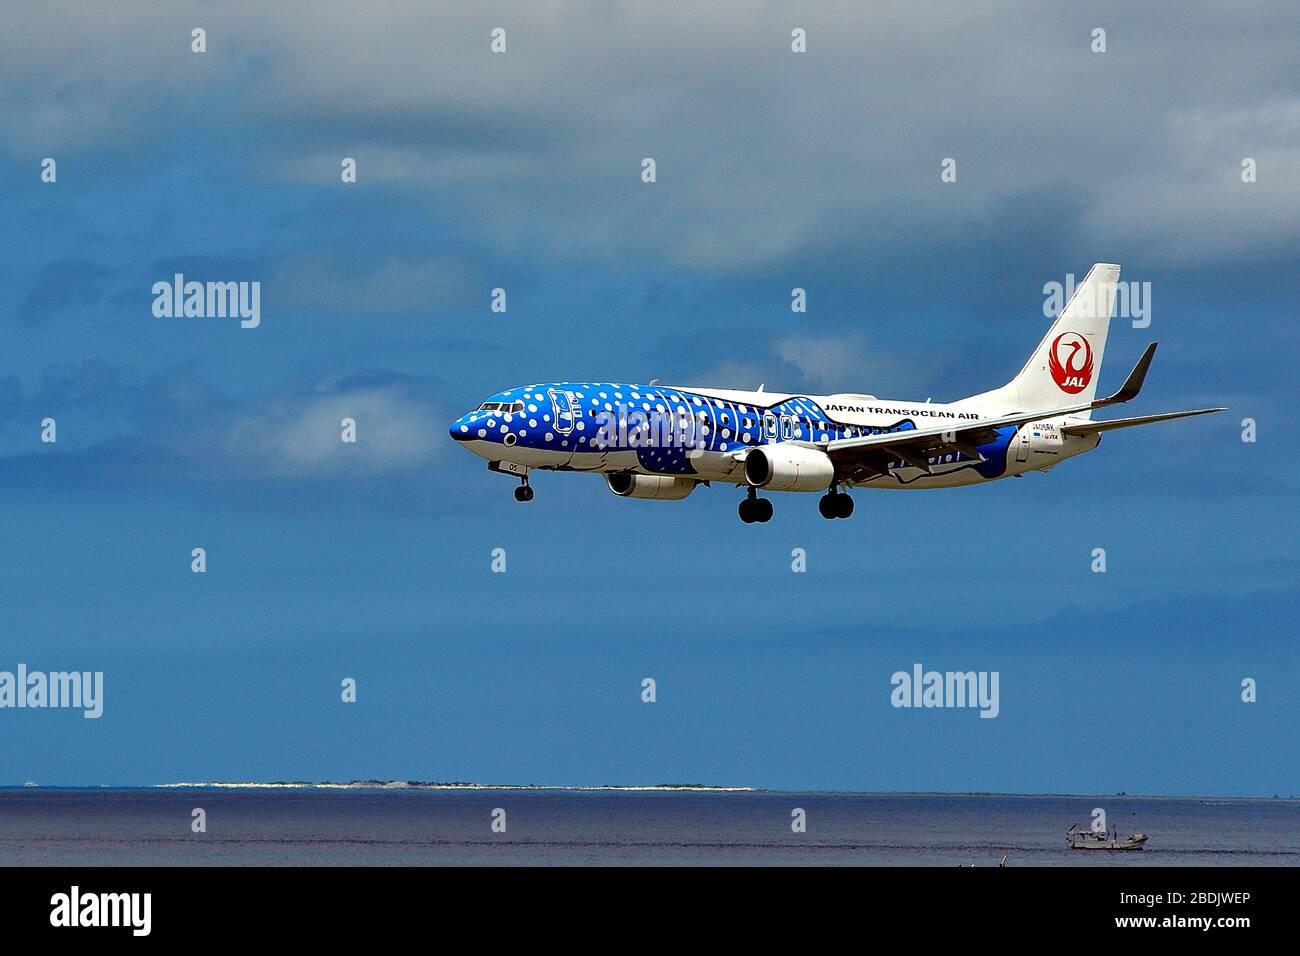 Japón Transocean Air, JTA, Boeing B-737/800, JA 05RK, Whaleshark, Landing, Aeropuerto Naha, Naha, Okinawa, Islas Ryukyu, Japón Foto de stock